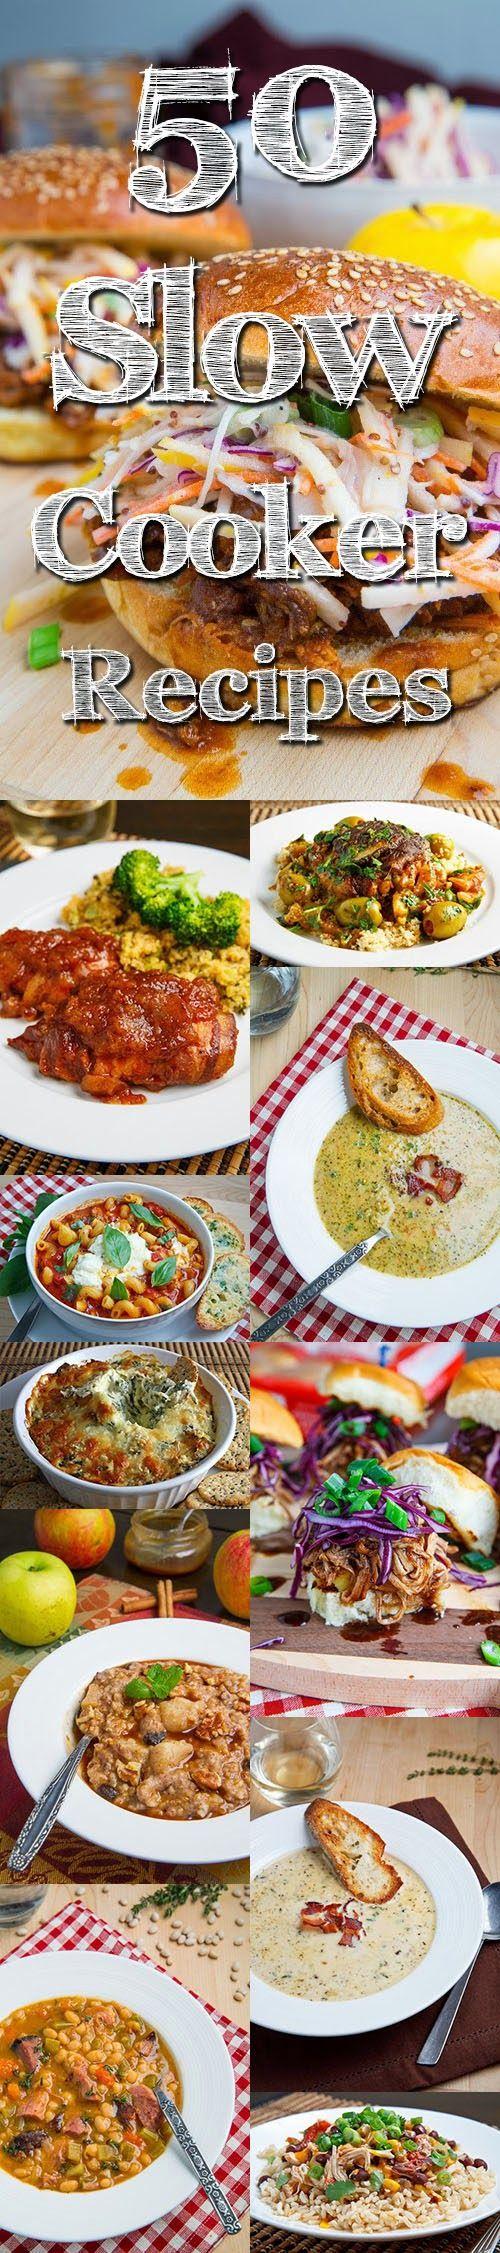 50 Slow Cooker Recipes {Closet Cooking}